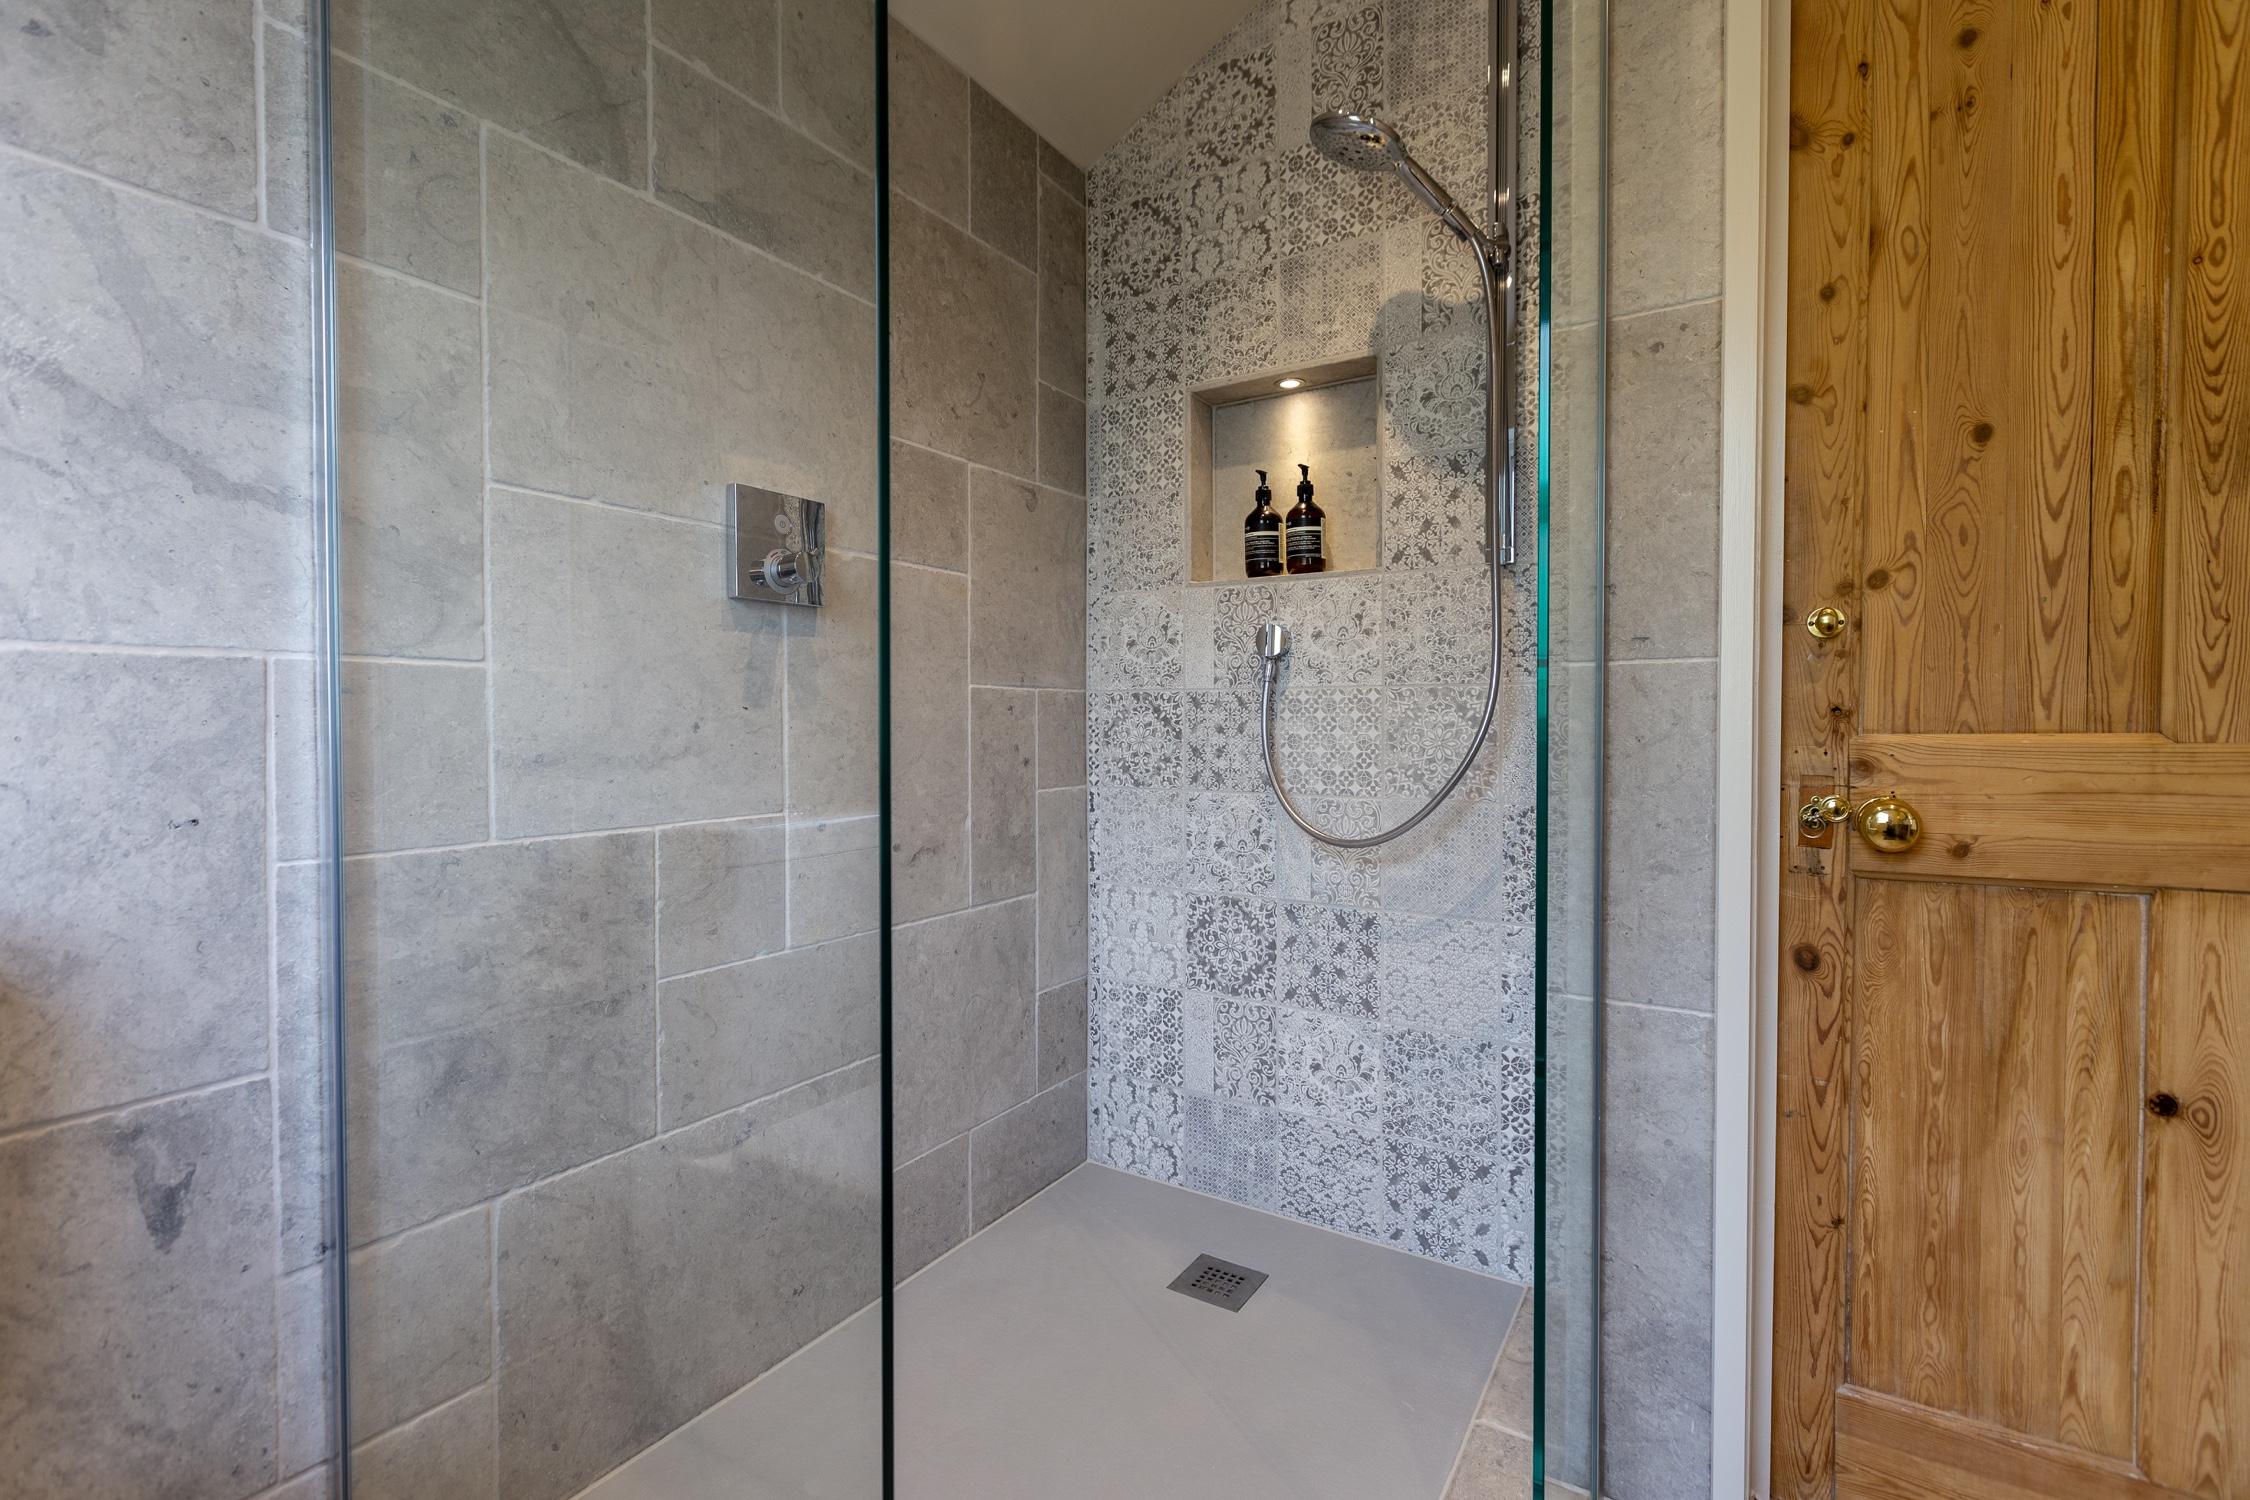 Astounding Rustic Wet Room Design Installation Jeremy Colson Download Free Architecture Designs Scobabritishbridgeorg